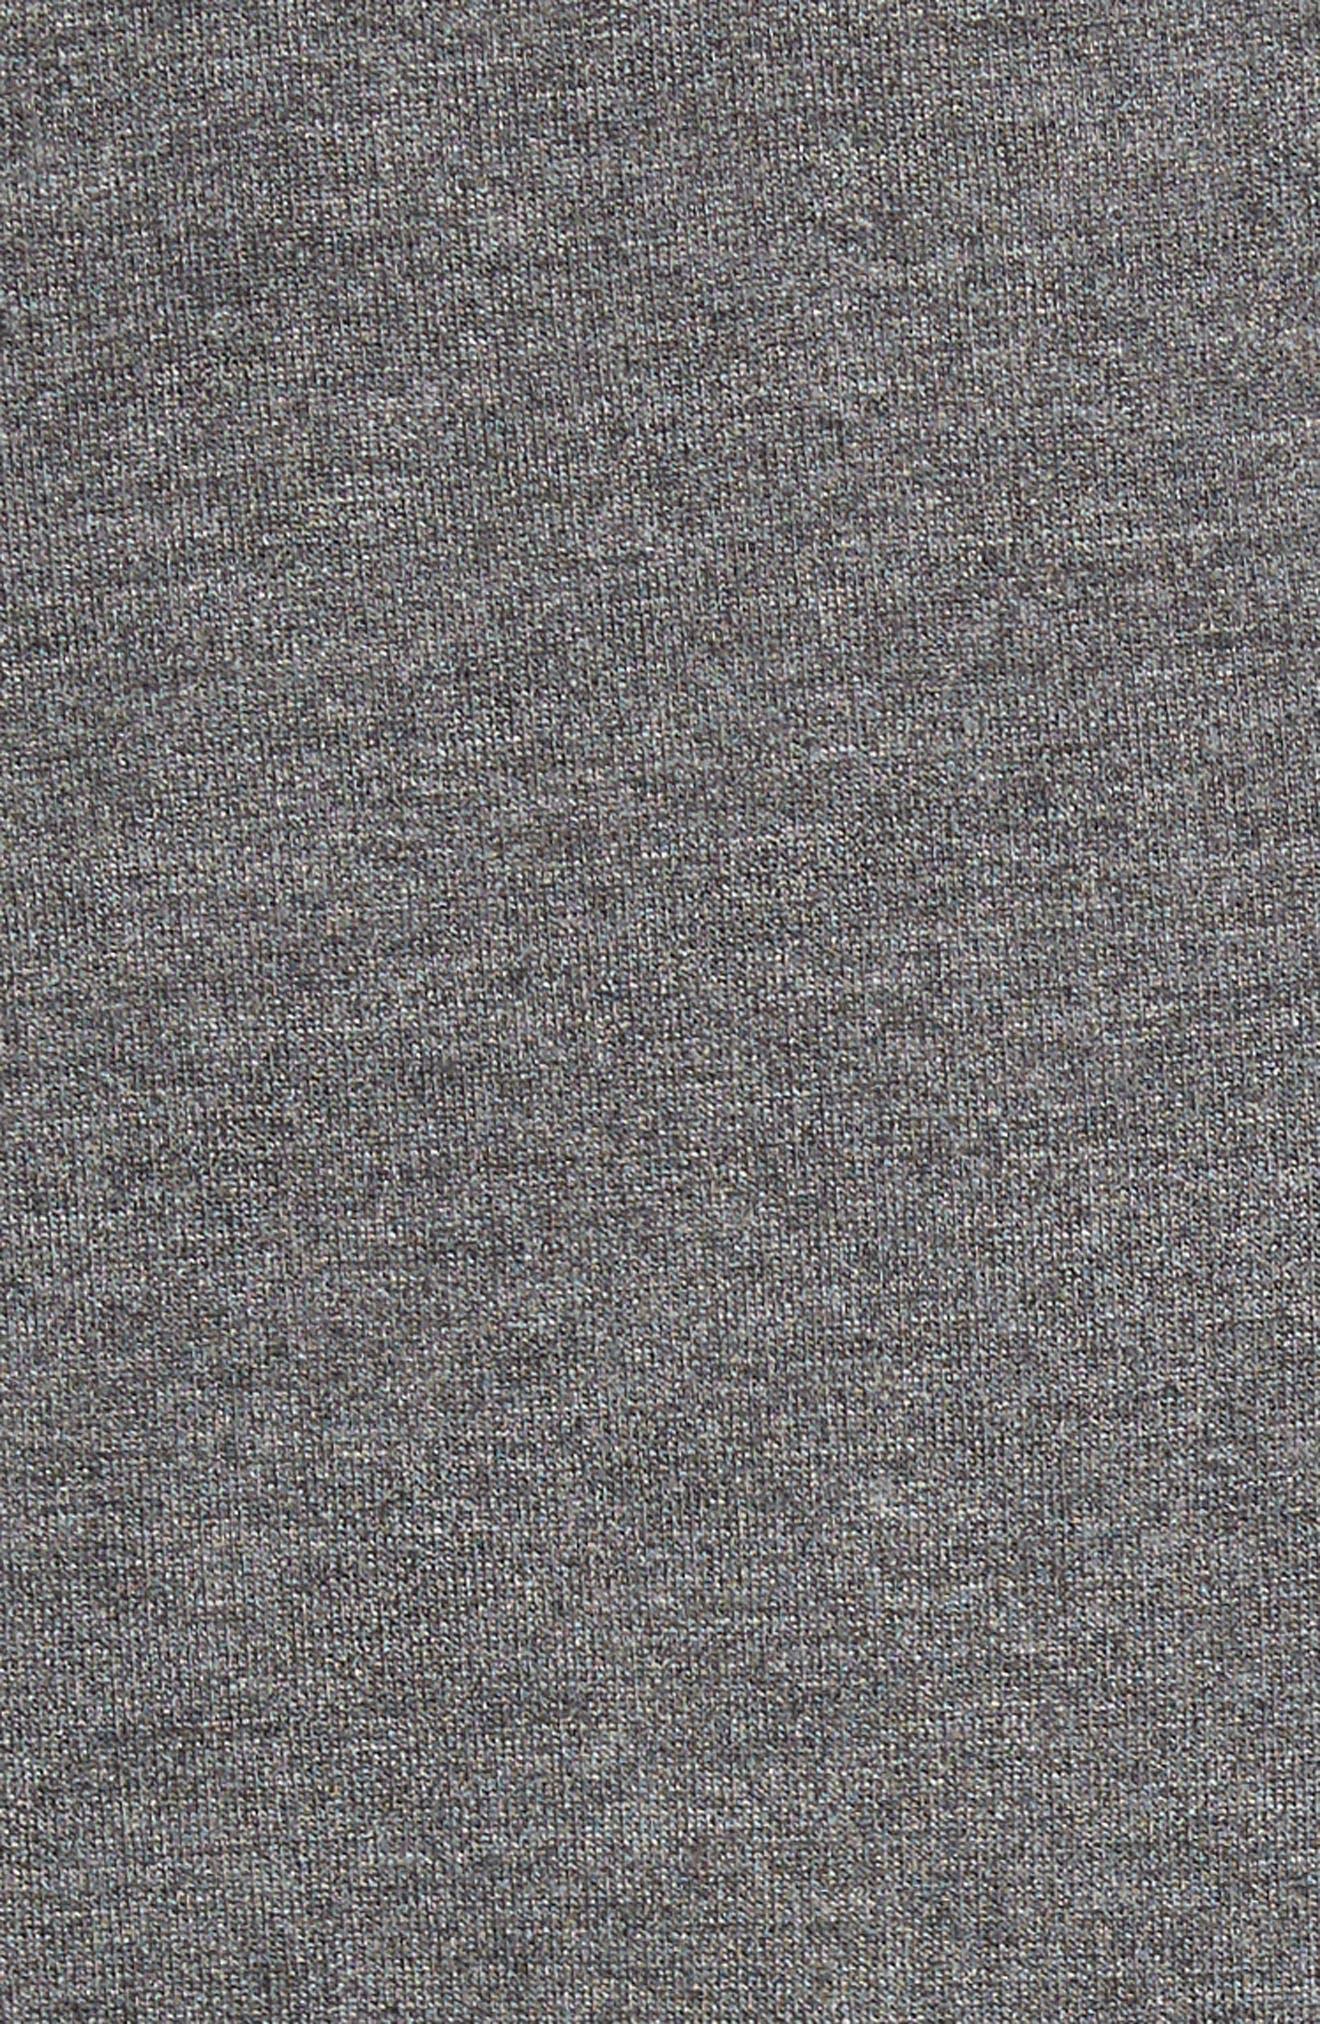 Eye Splice Choker Sweatshirt,                             Alternate thumbnail 14, color,